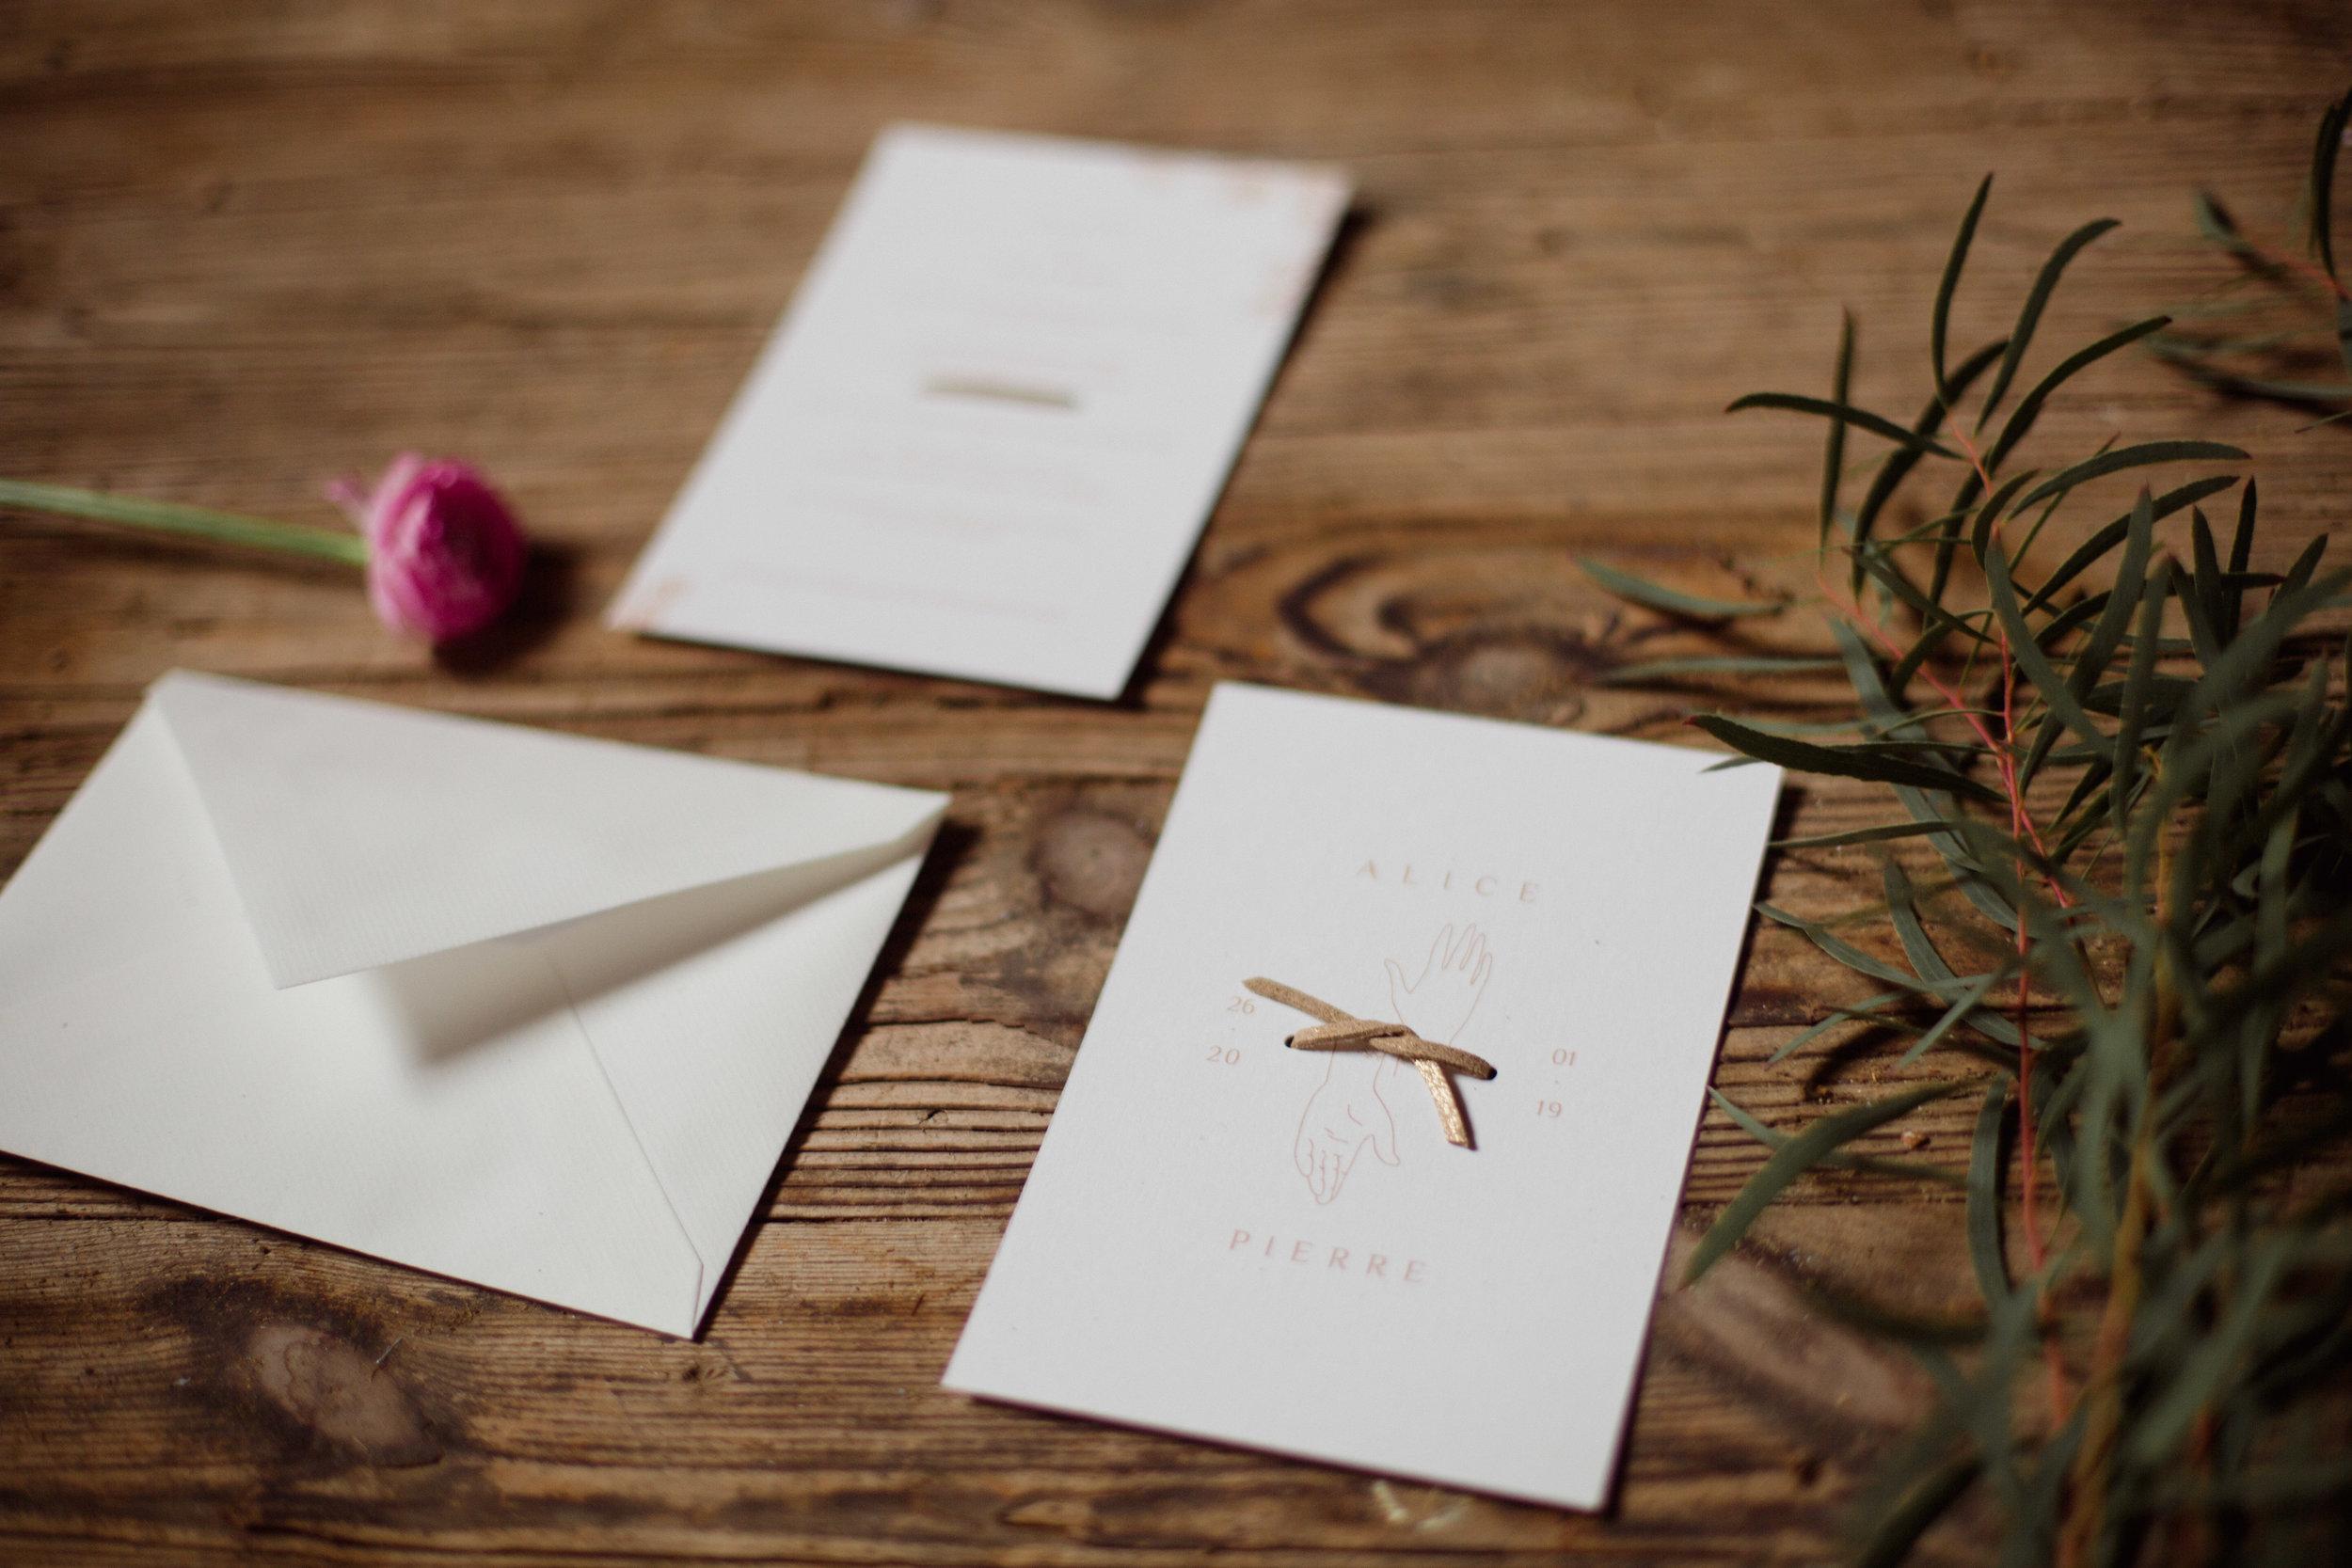 mariage_folk_rock_bordeaux_centre_photographe_dordogne_pauline_maroussia_robes_mariage_wednesday_atelier